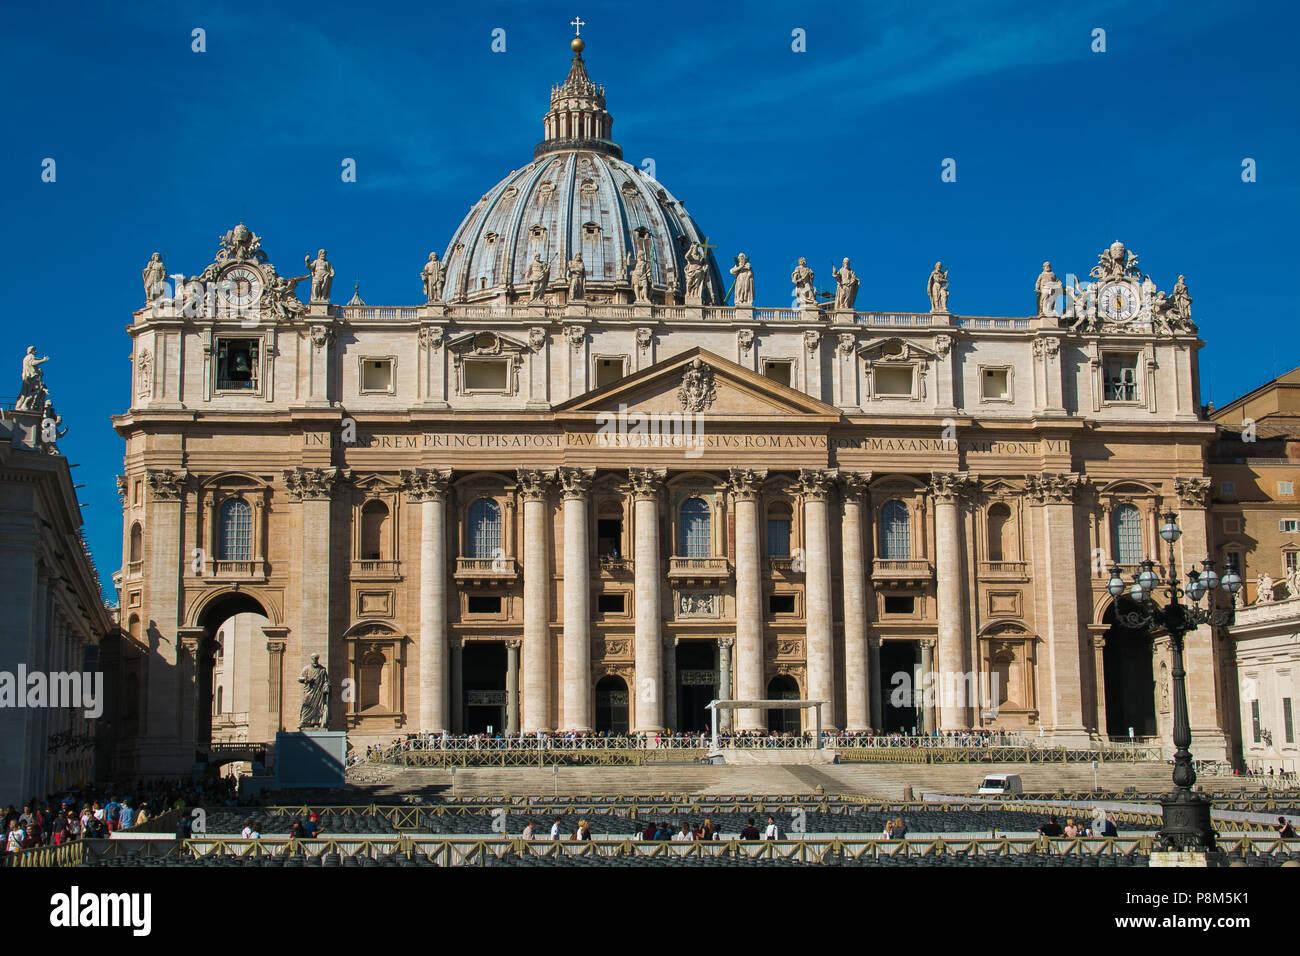 VATICAN CITY, VATICAN - OCTOBER 10, 2017: View of St. Peter's Basilica, Vatican City Stock Photo